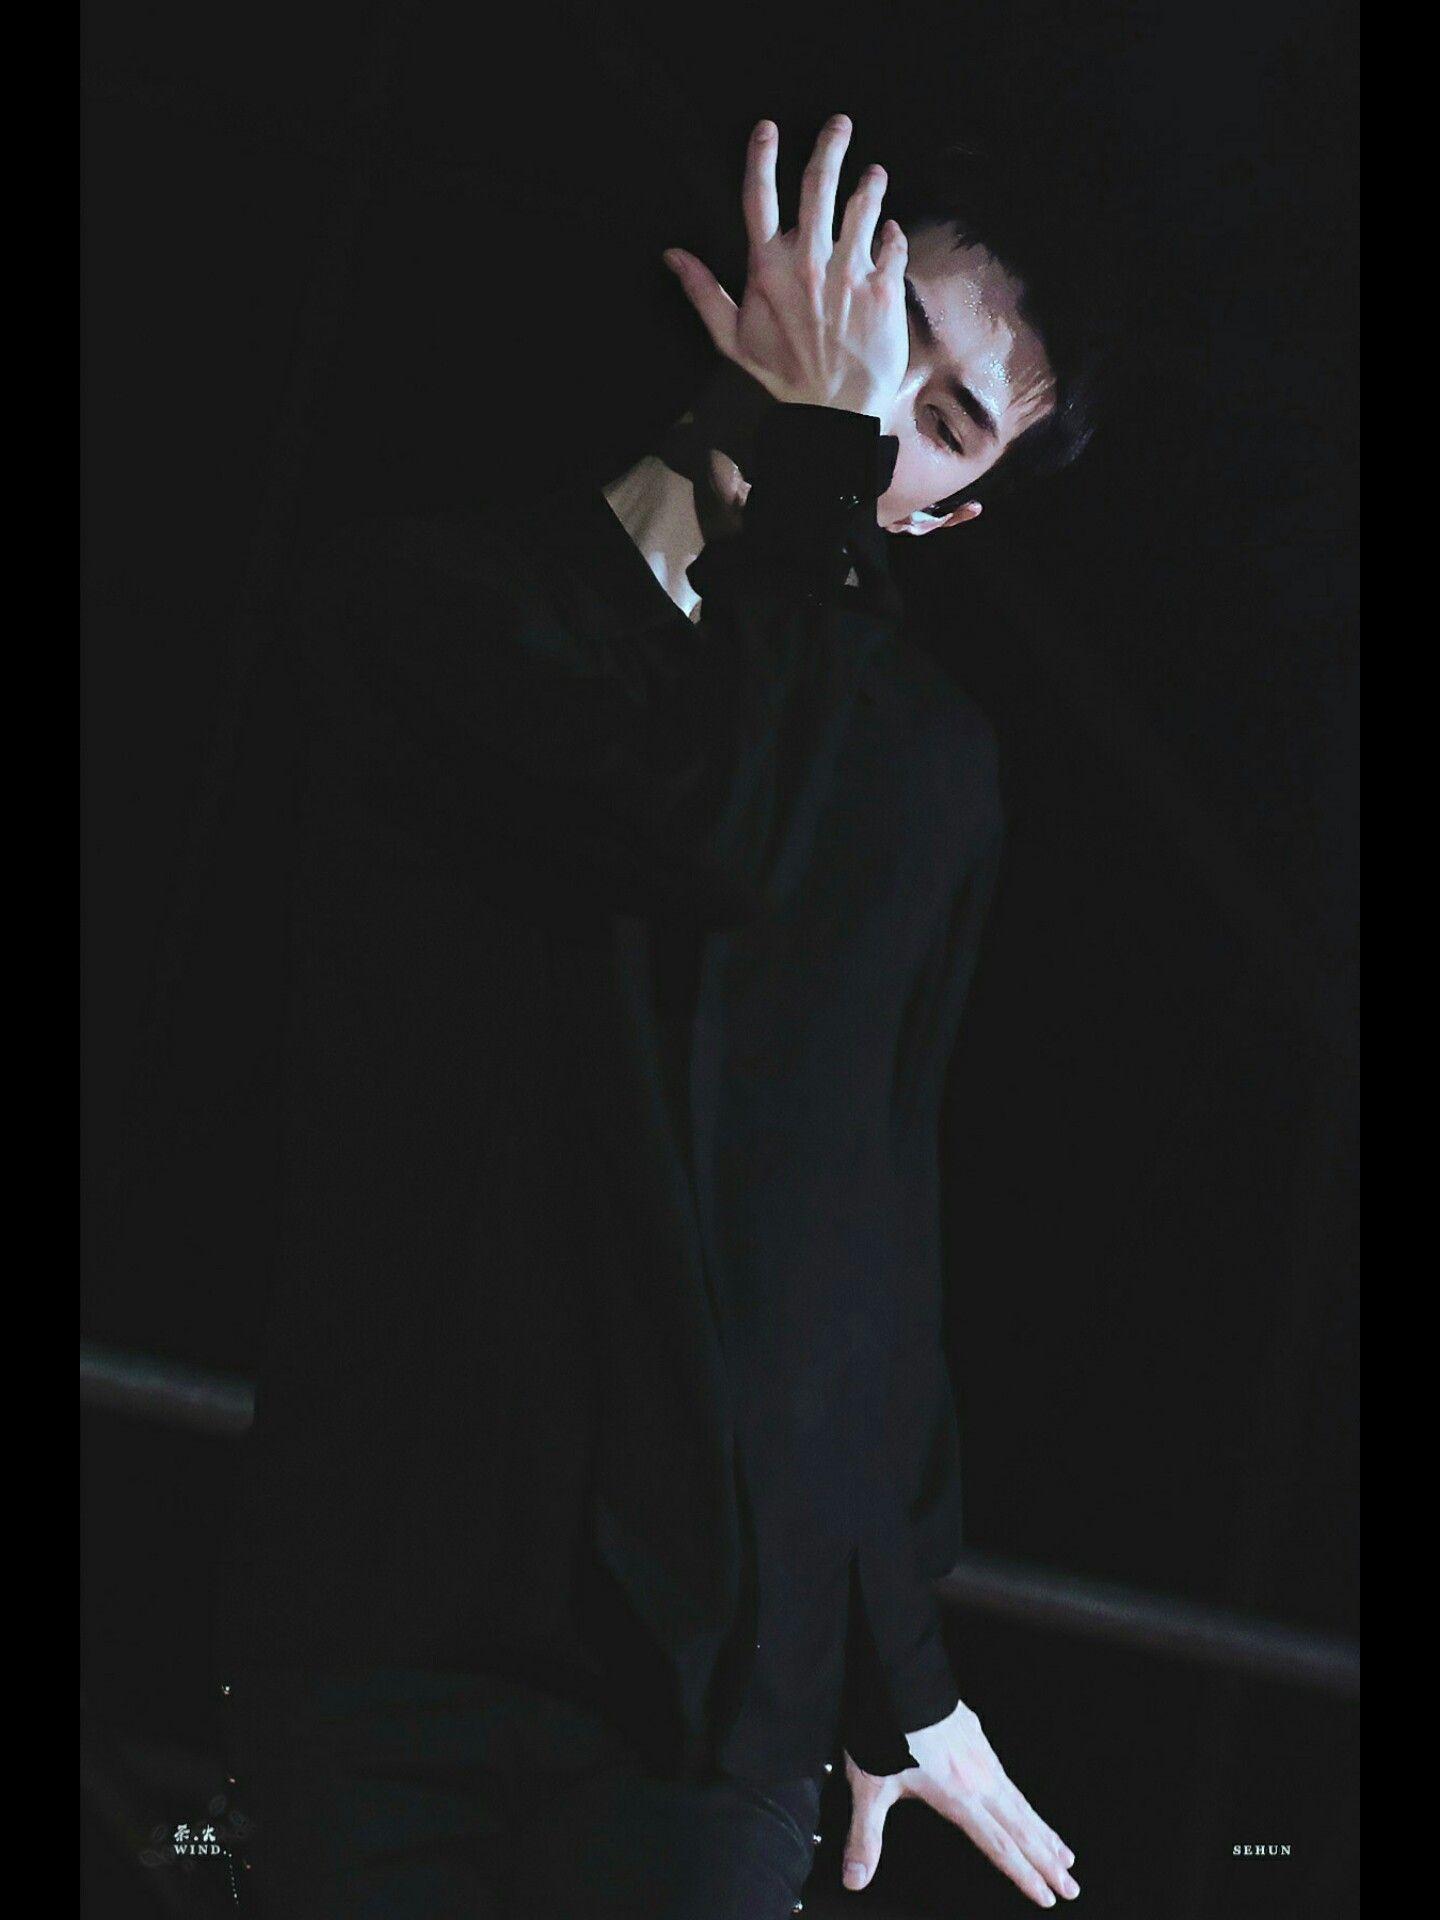 #EXO #엑소 #Weareone #Suho #Leader #KimJunMyeon #김준면 #Lay #Yixing #Zhanh